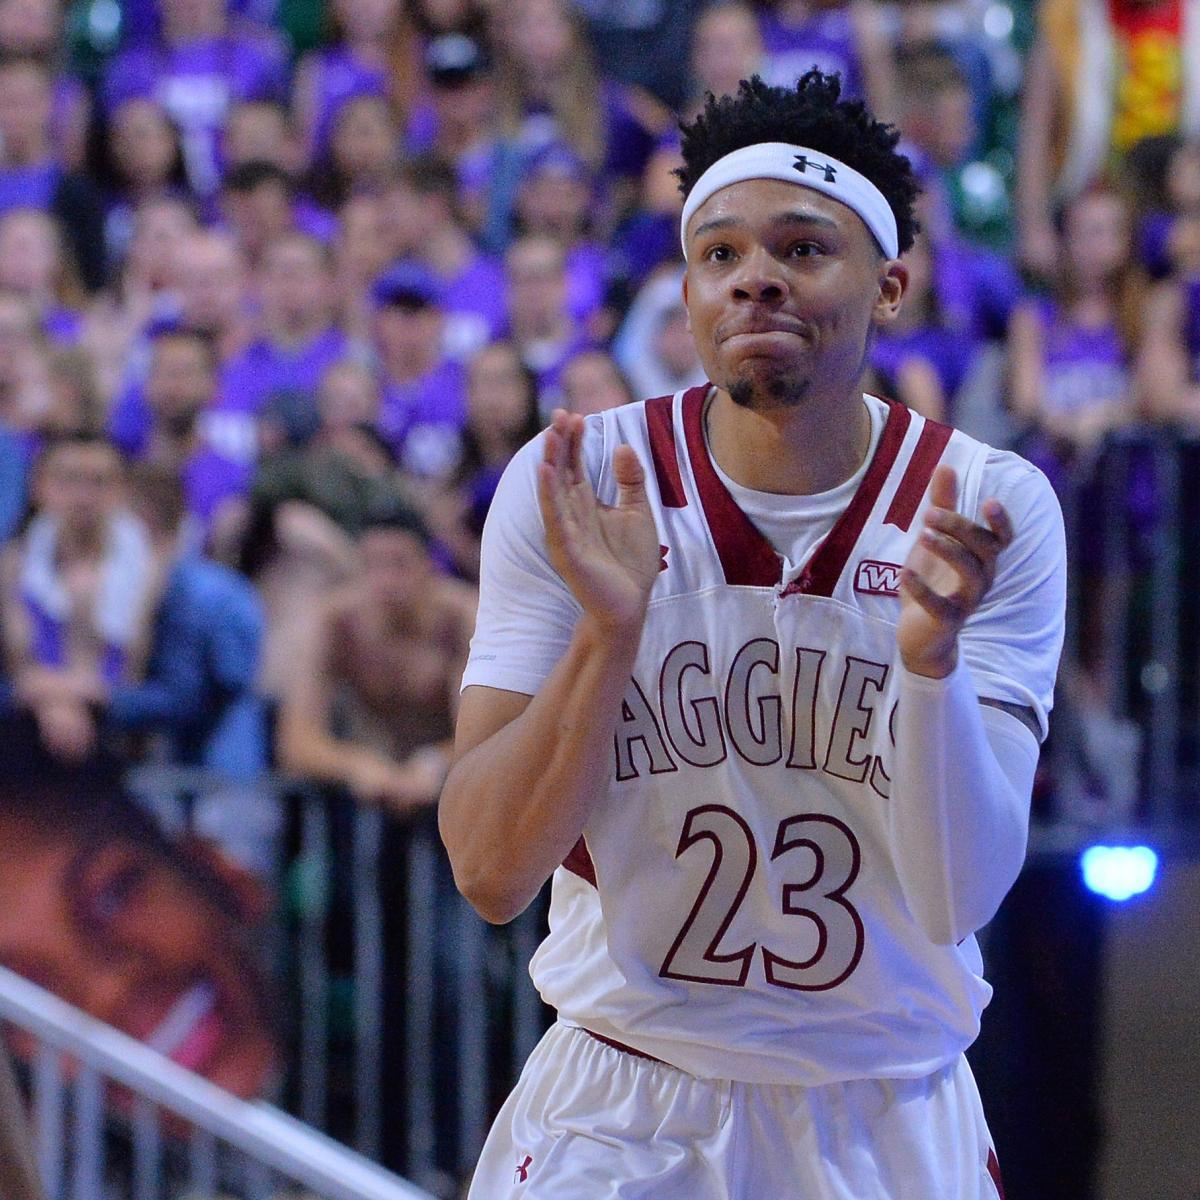 NCAA Tournament 2018: 1st-Round Upset Picks to Add to Your Bracket